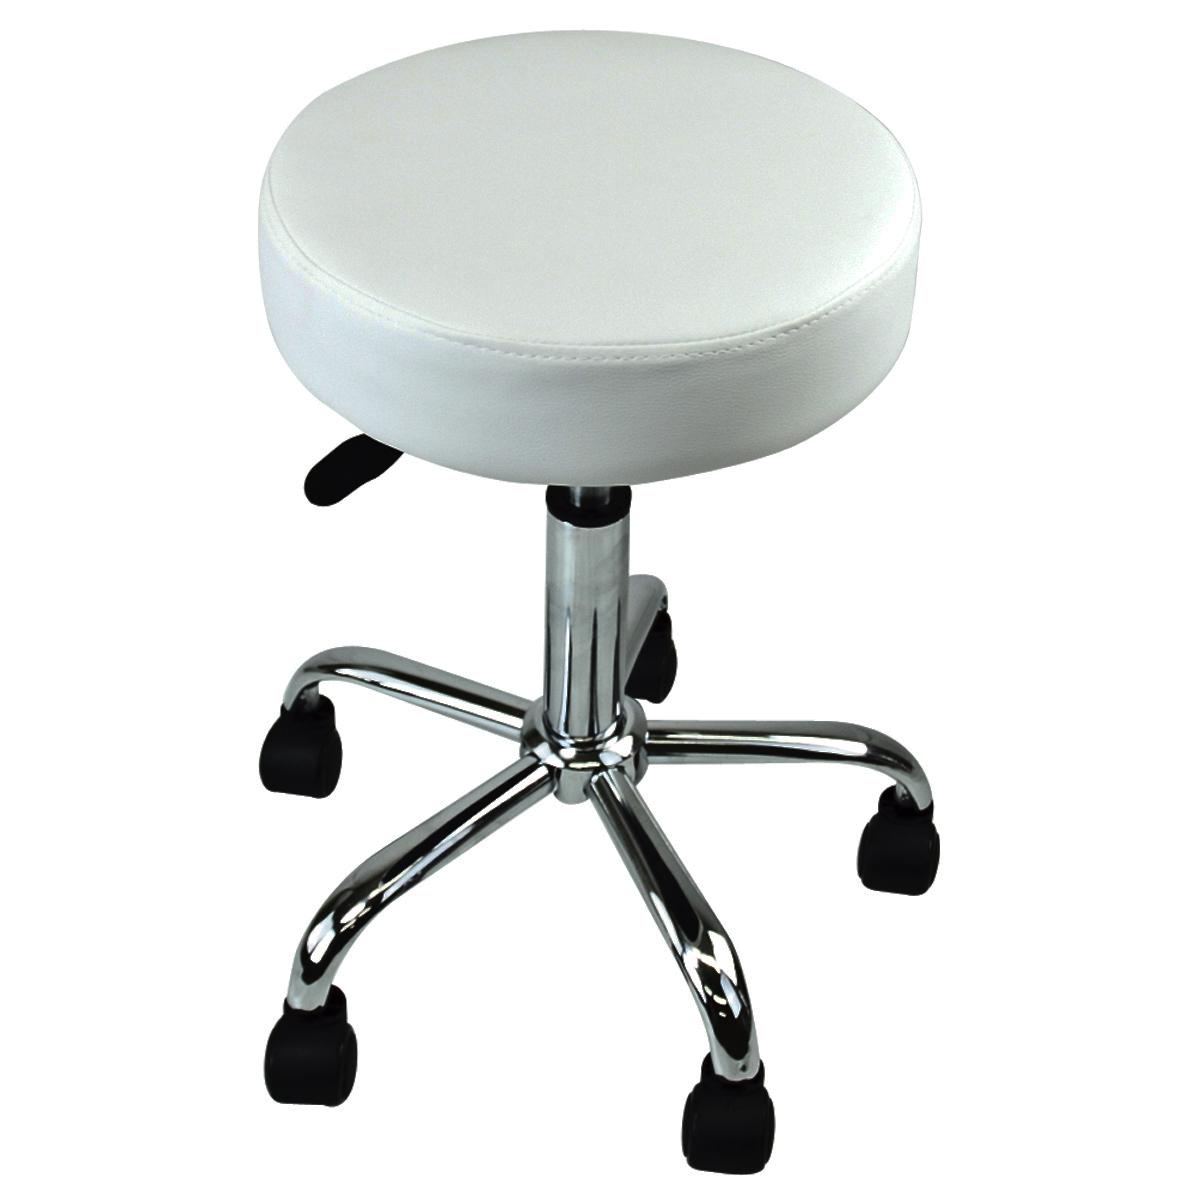 New White Salon Spa Tattoo Stool Equipment Medical Chair